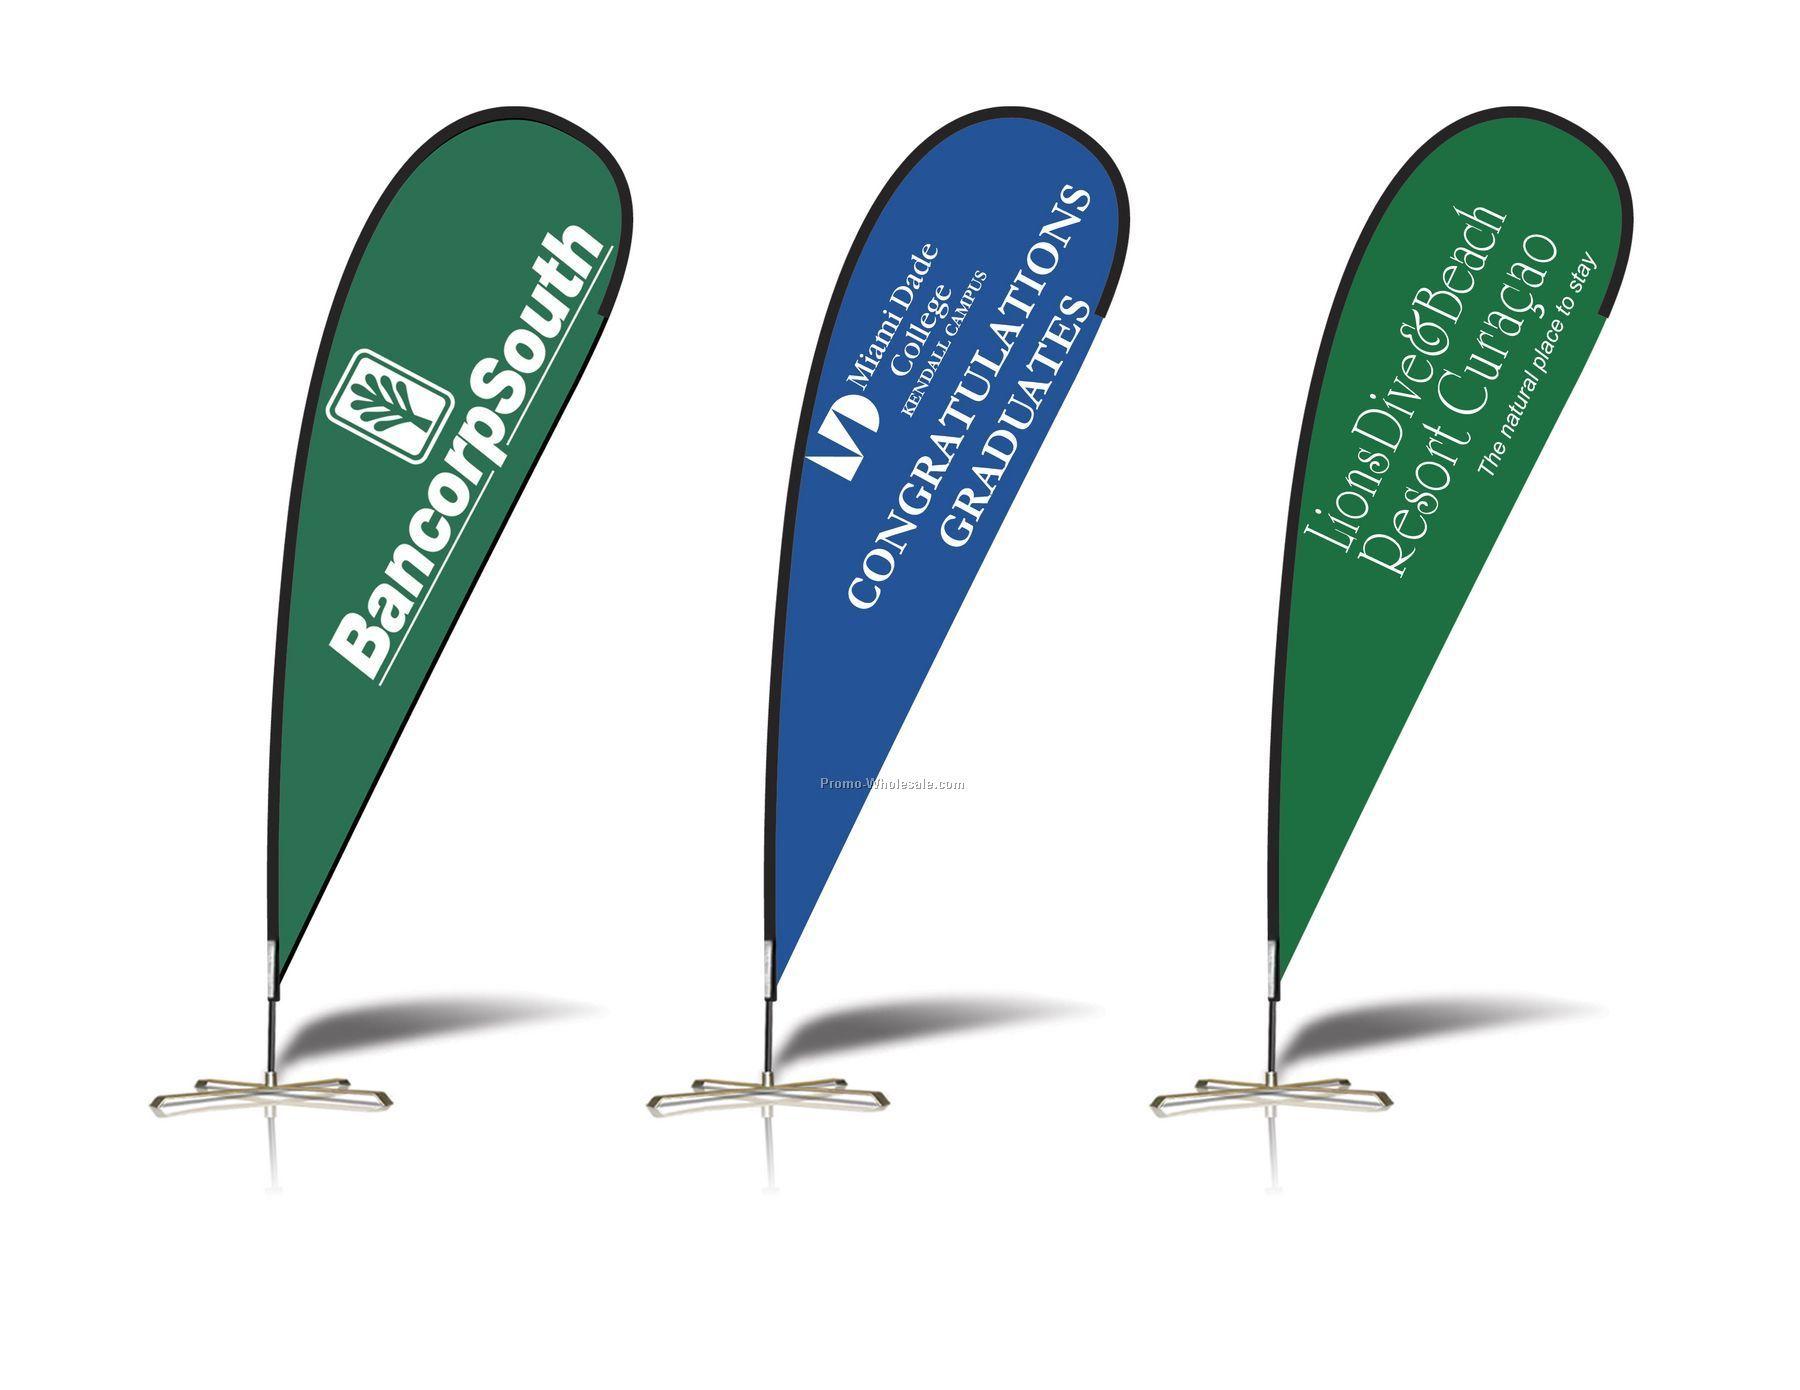 https://www.aeonlaser.net/application/industry-applications/banner-flag/